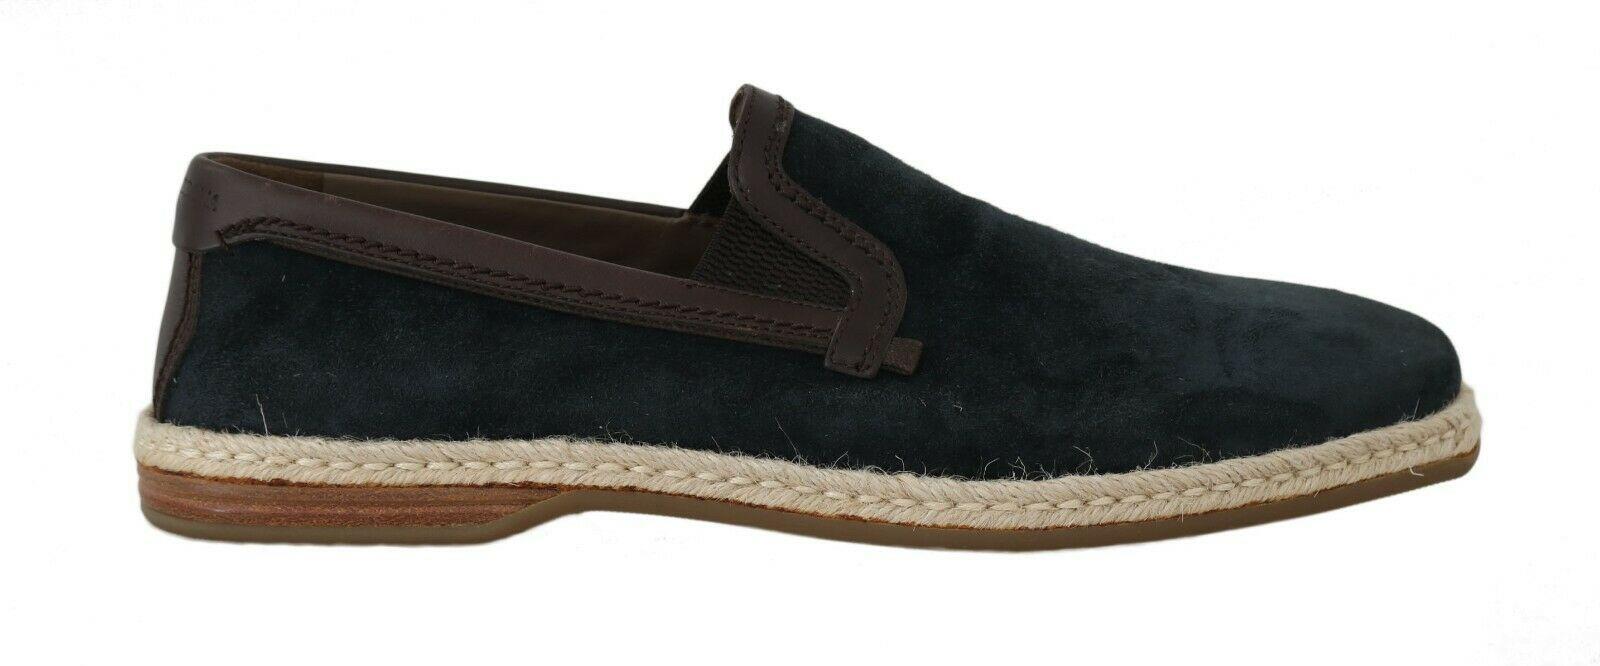 Dolce & Gabbana Men's Leather Suede Casual Loafers Blue MV2179 - EU40/US7